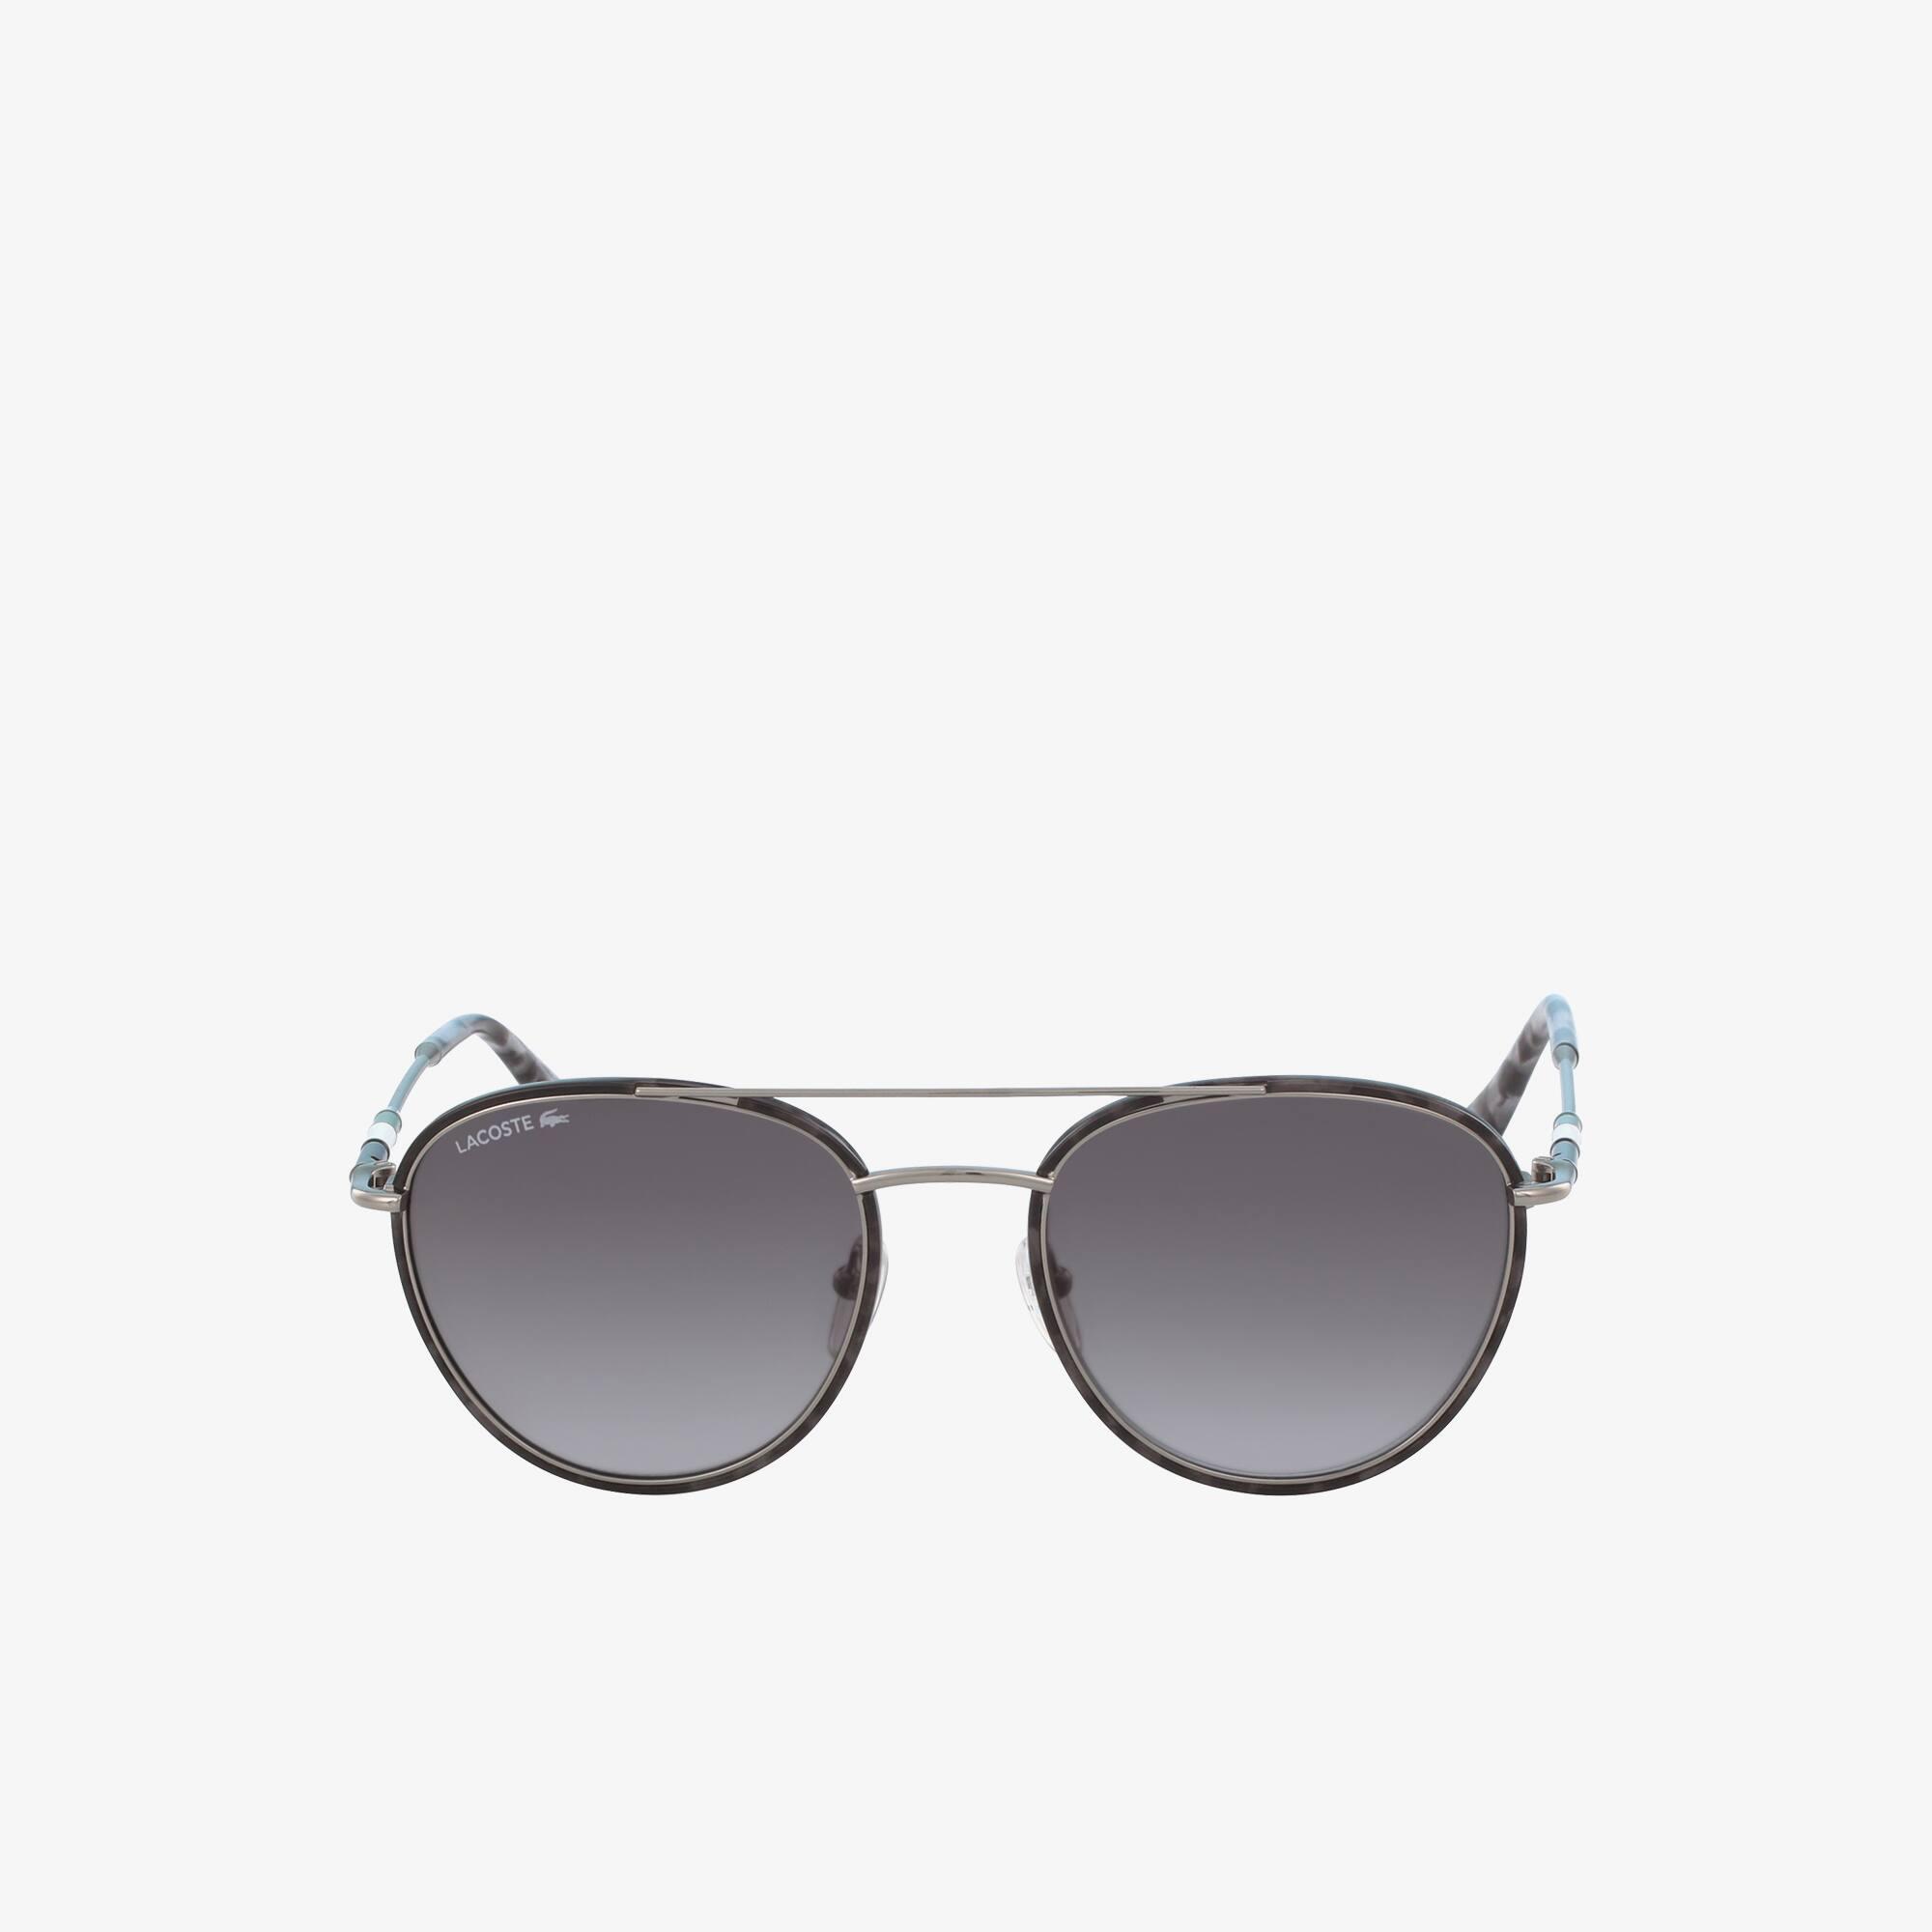 Heritage Sunglasses in Metal Novak Djokovic Edition